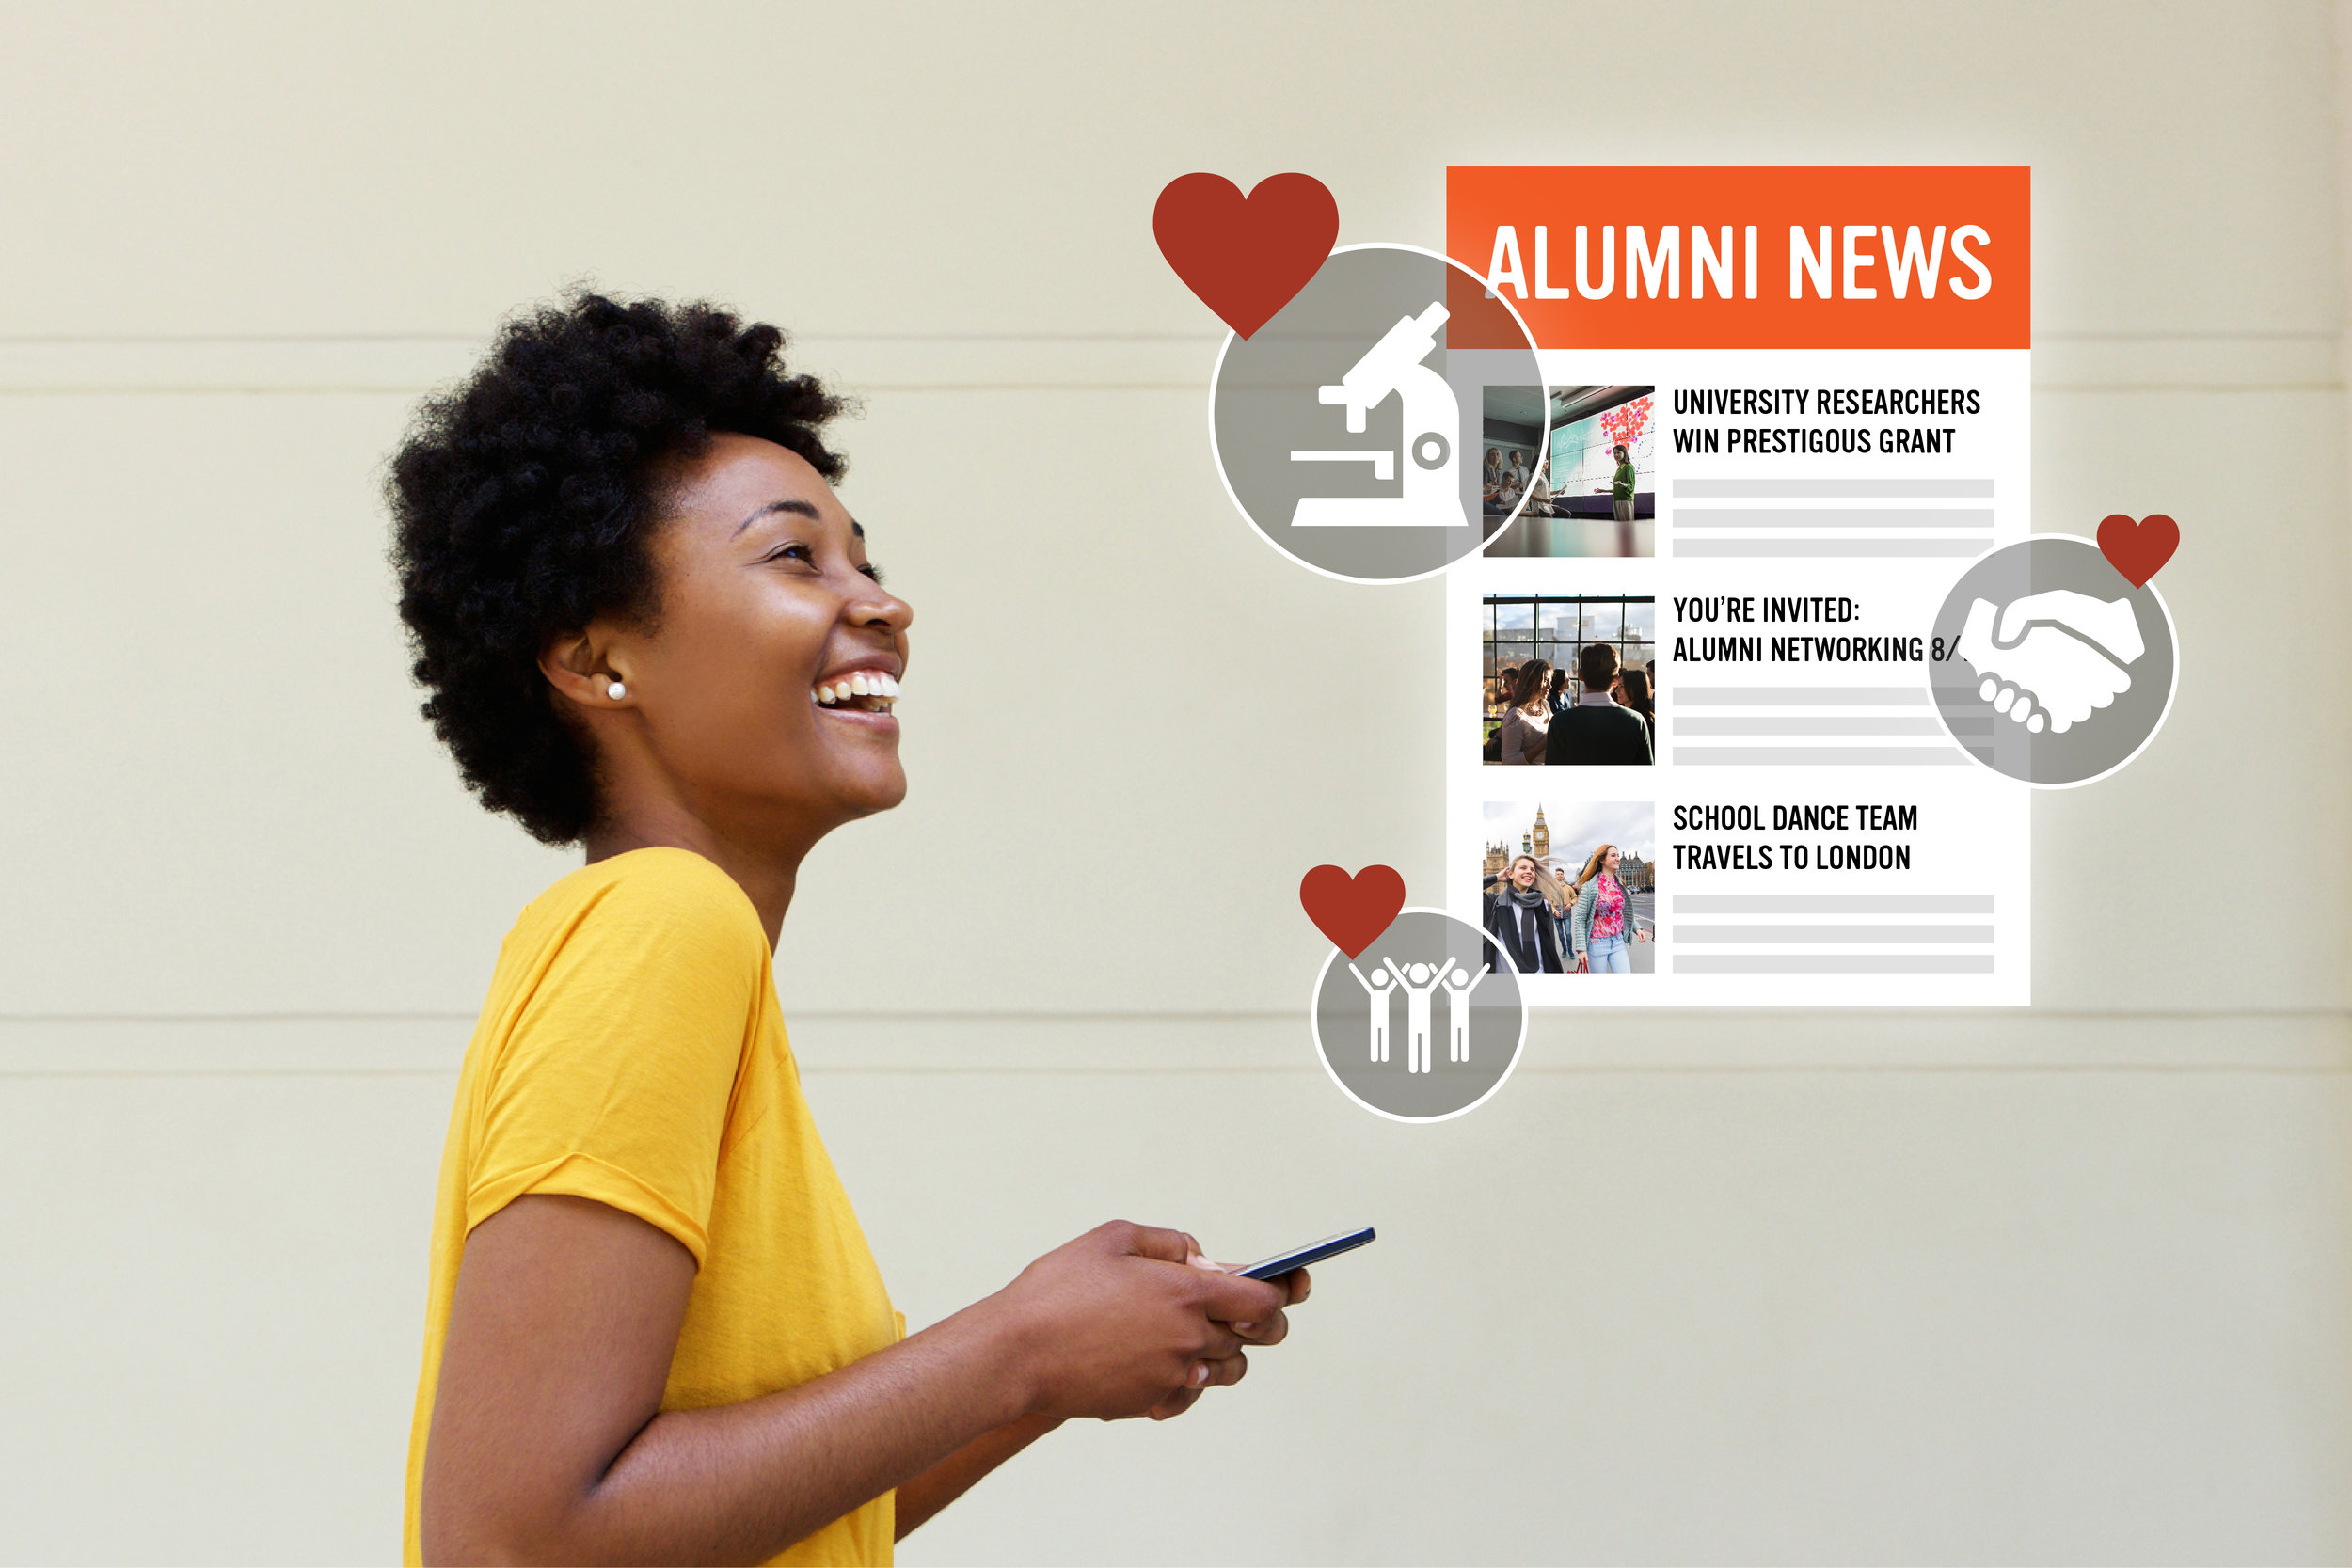 alumni news loves-01.jpg